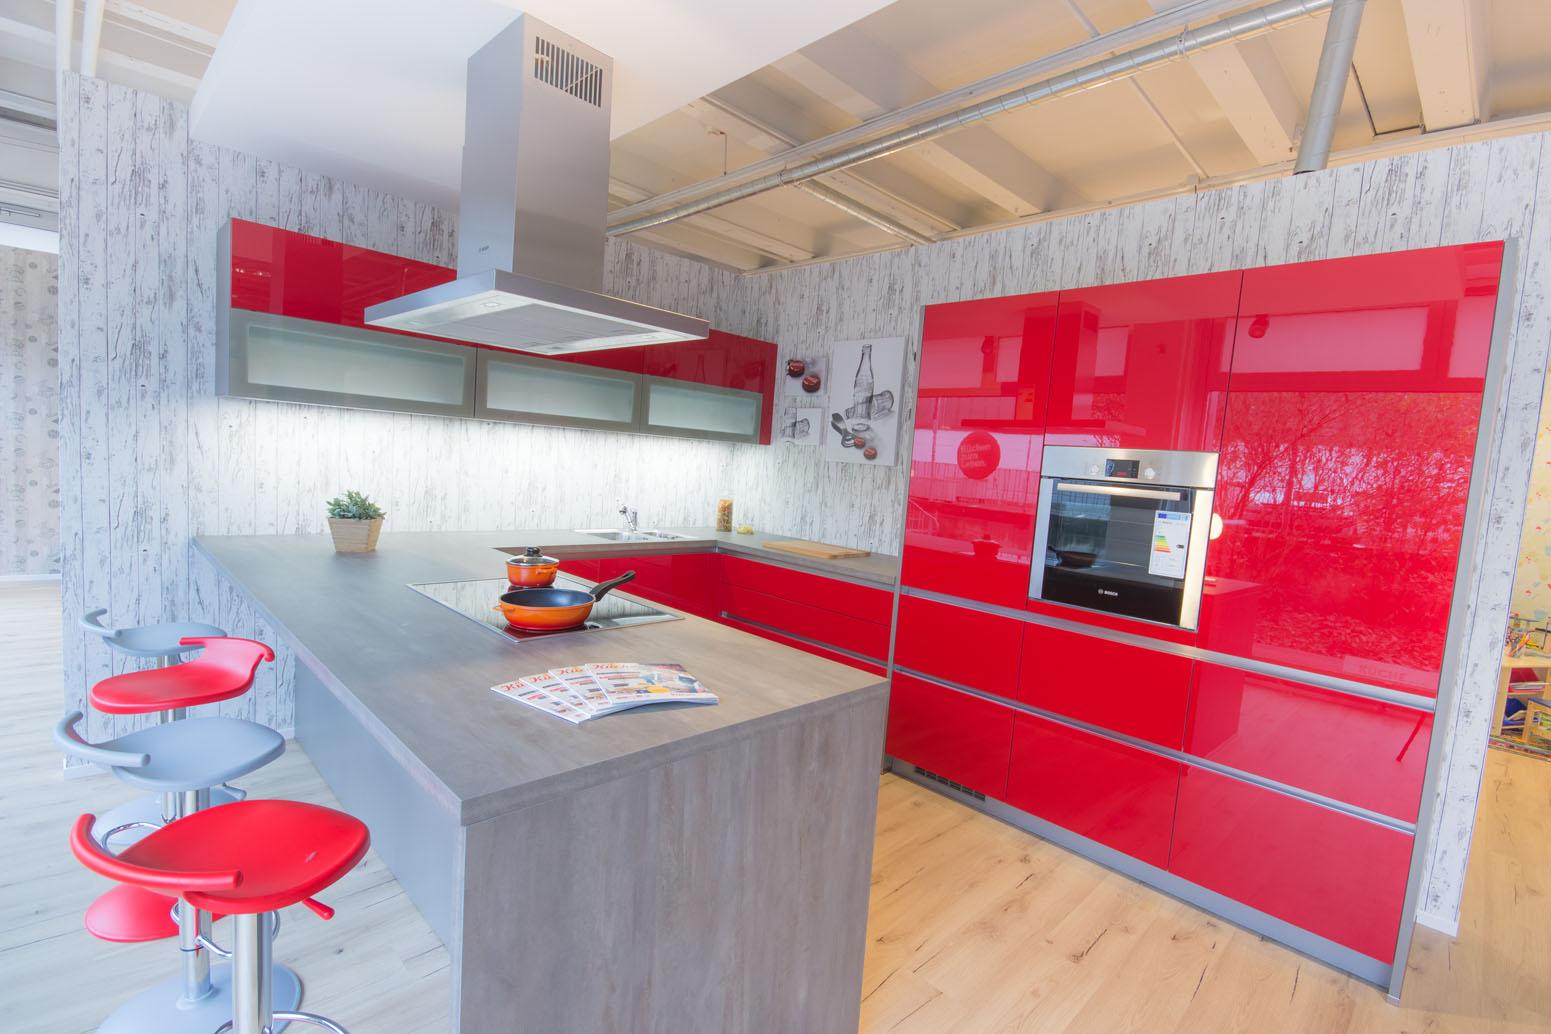 k chen in aschaffenburg. Black Bedroom Furniture Sets. Home Design Ideas